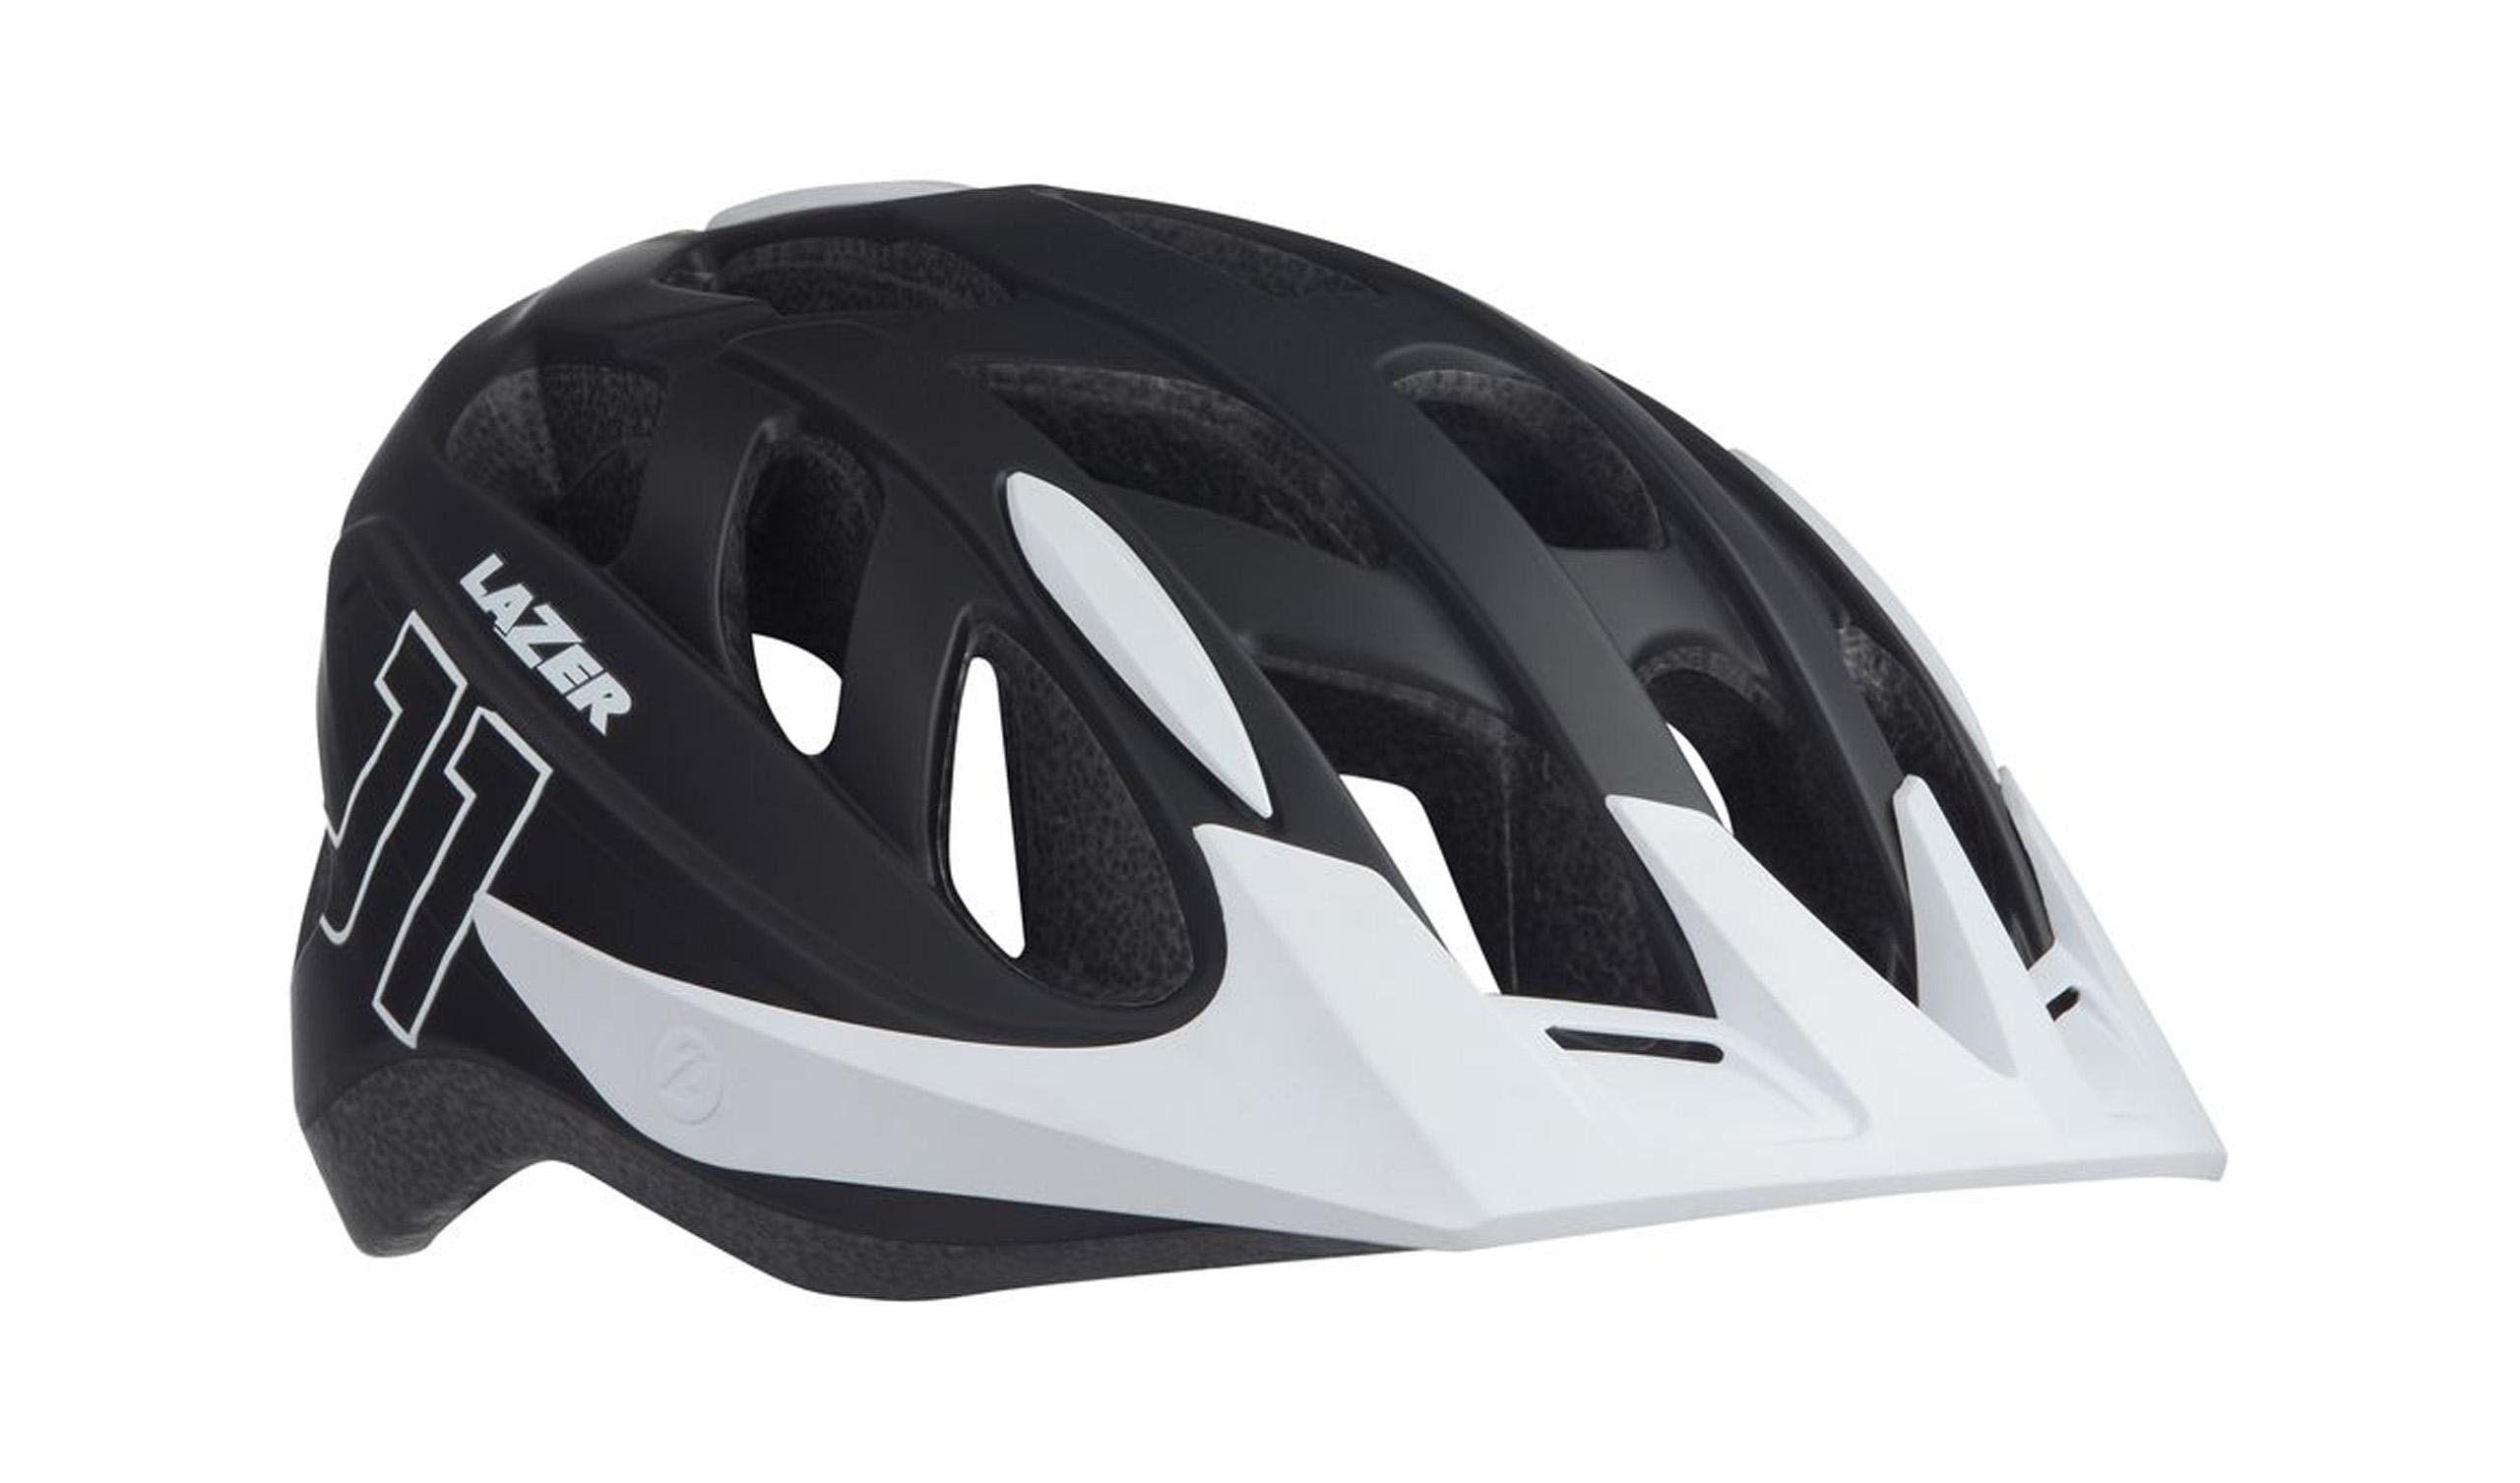 Blue 50-54cm Raleigh Unisex-Youth Pop Cycle Helmet